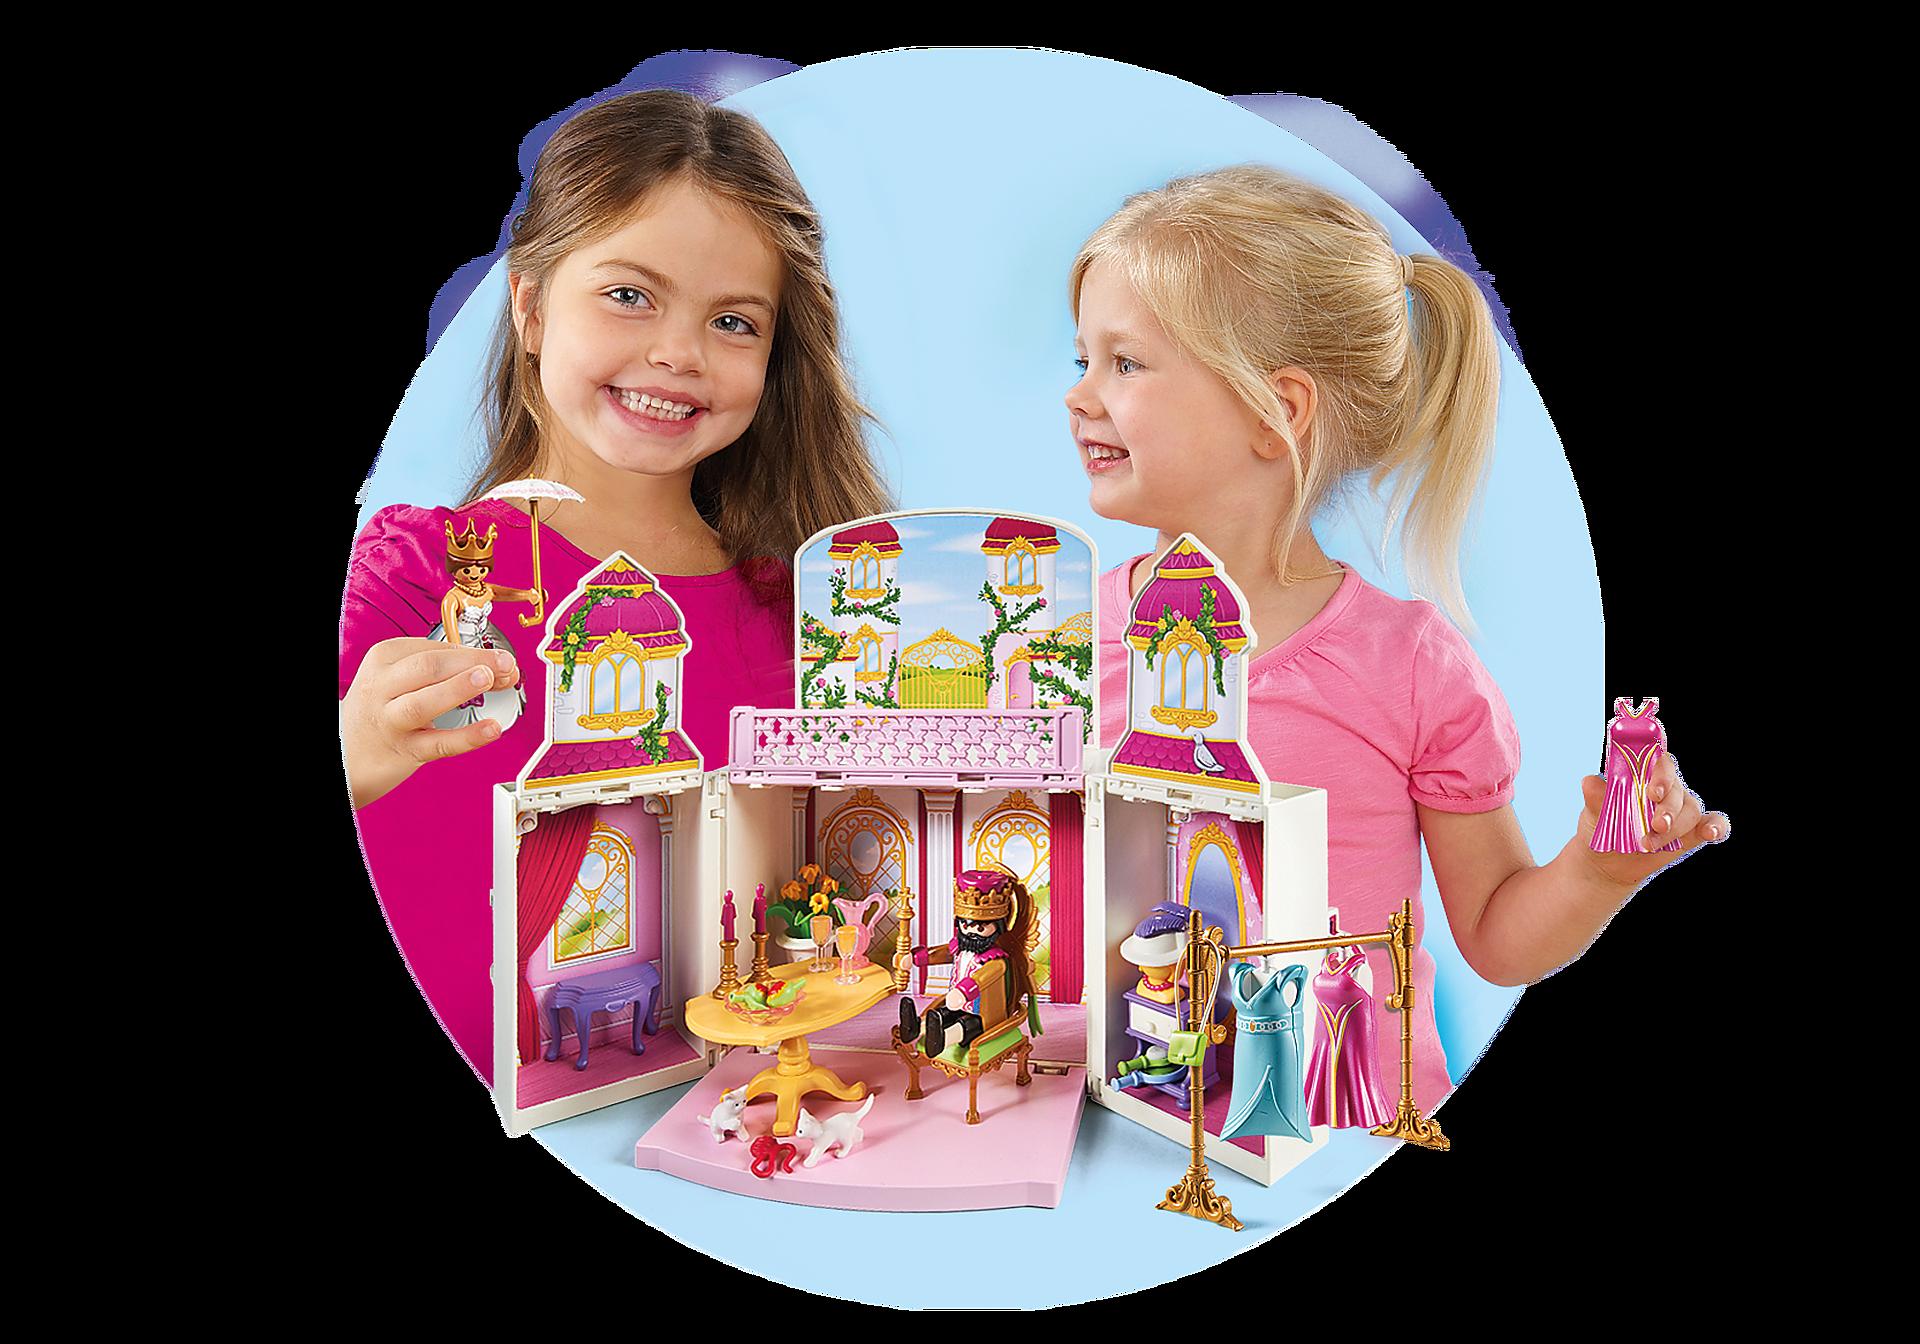 http://media.playmobil.com/i/playmobil/4898_product_extra4/My Secret Royal Palace Play Box